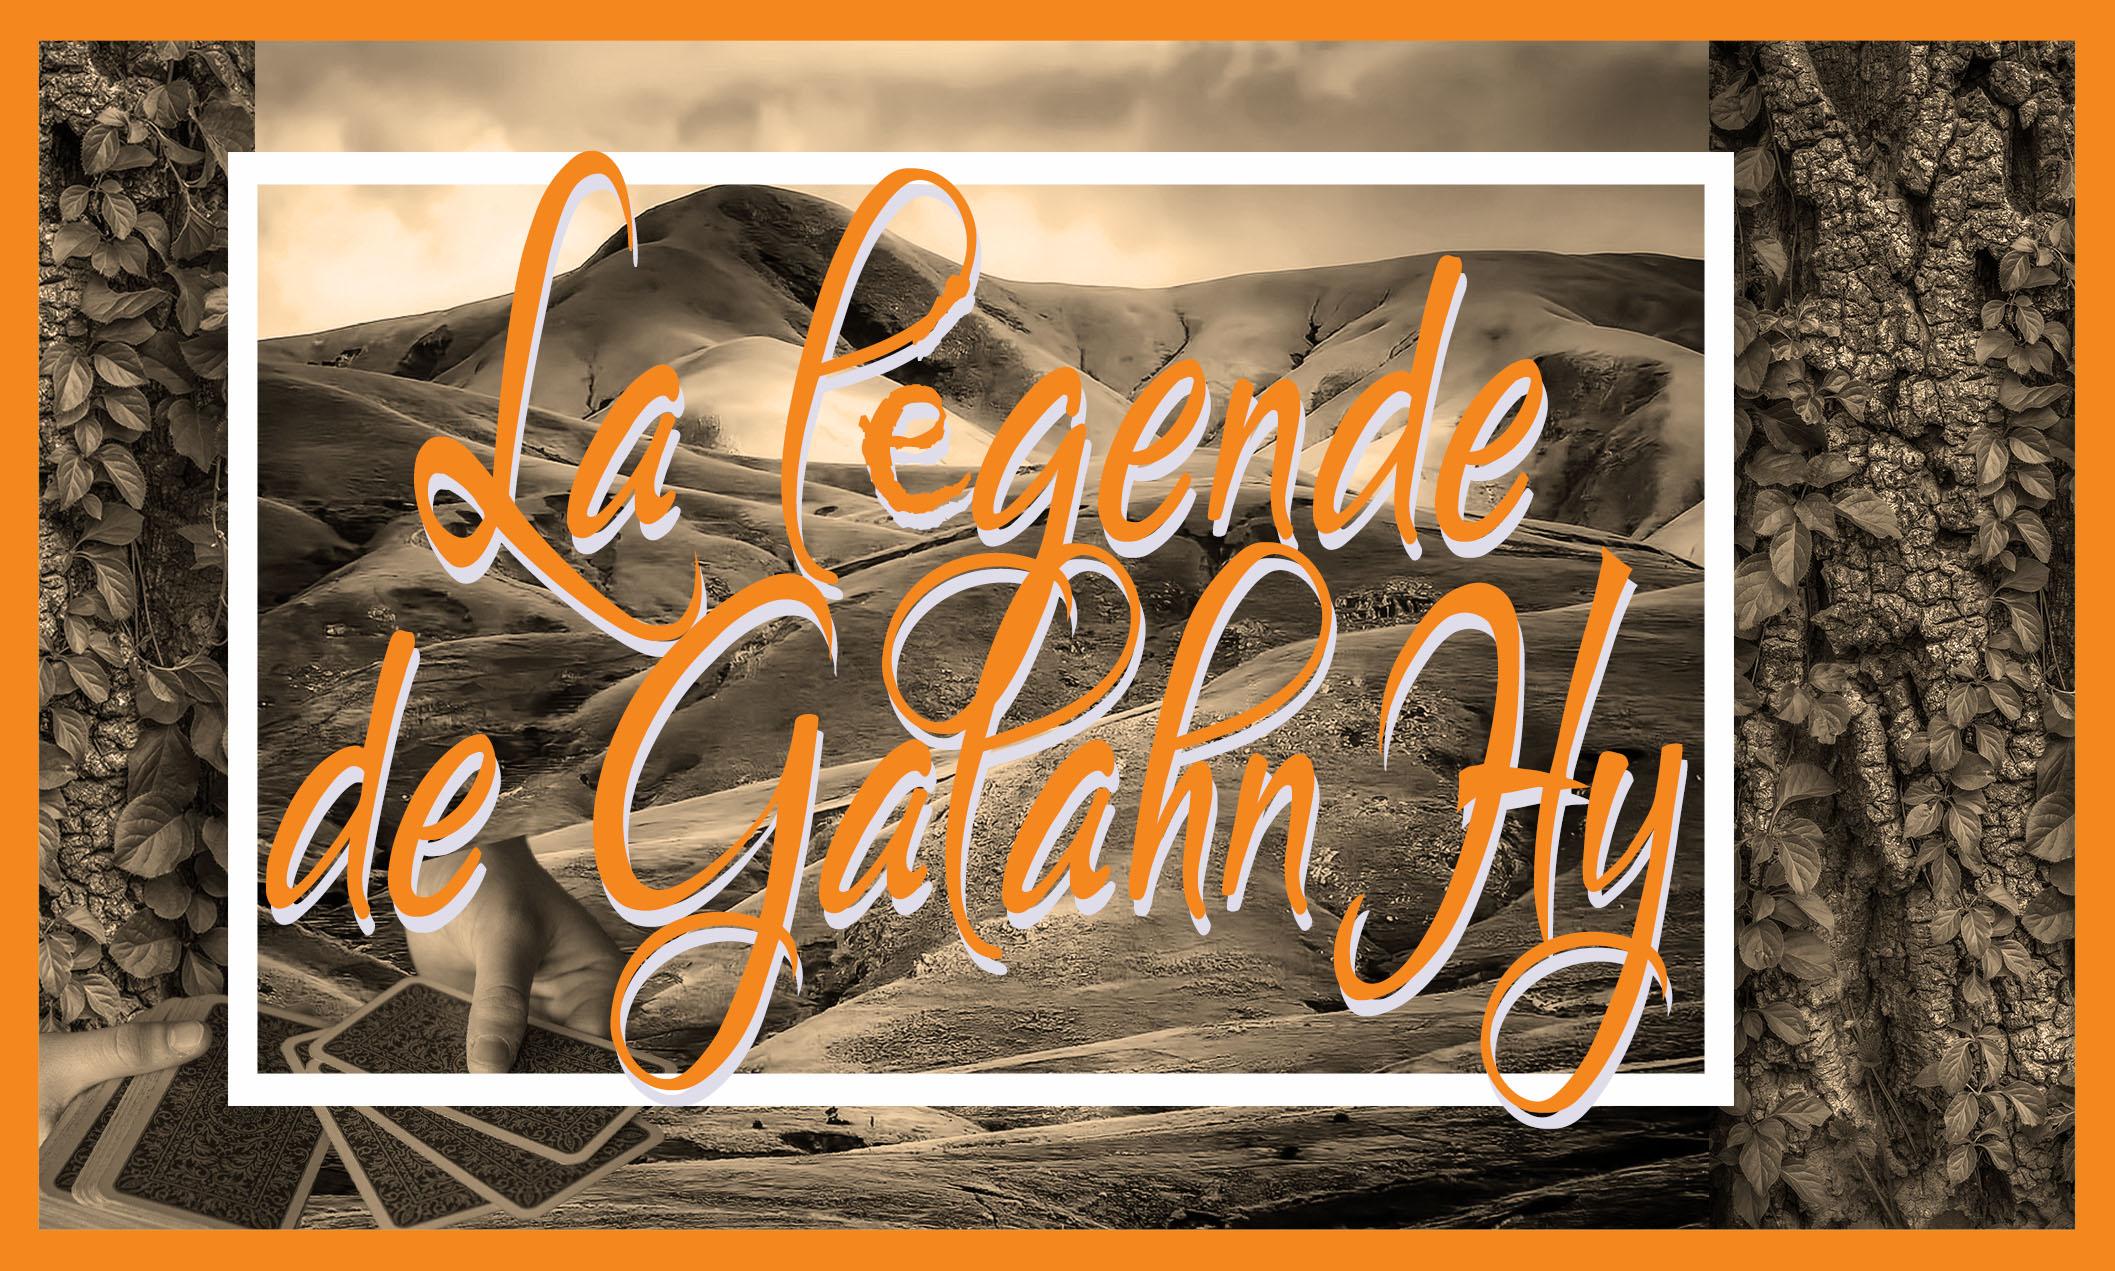 La légende de GalahnHy